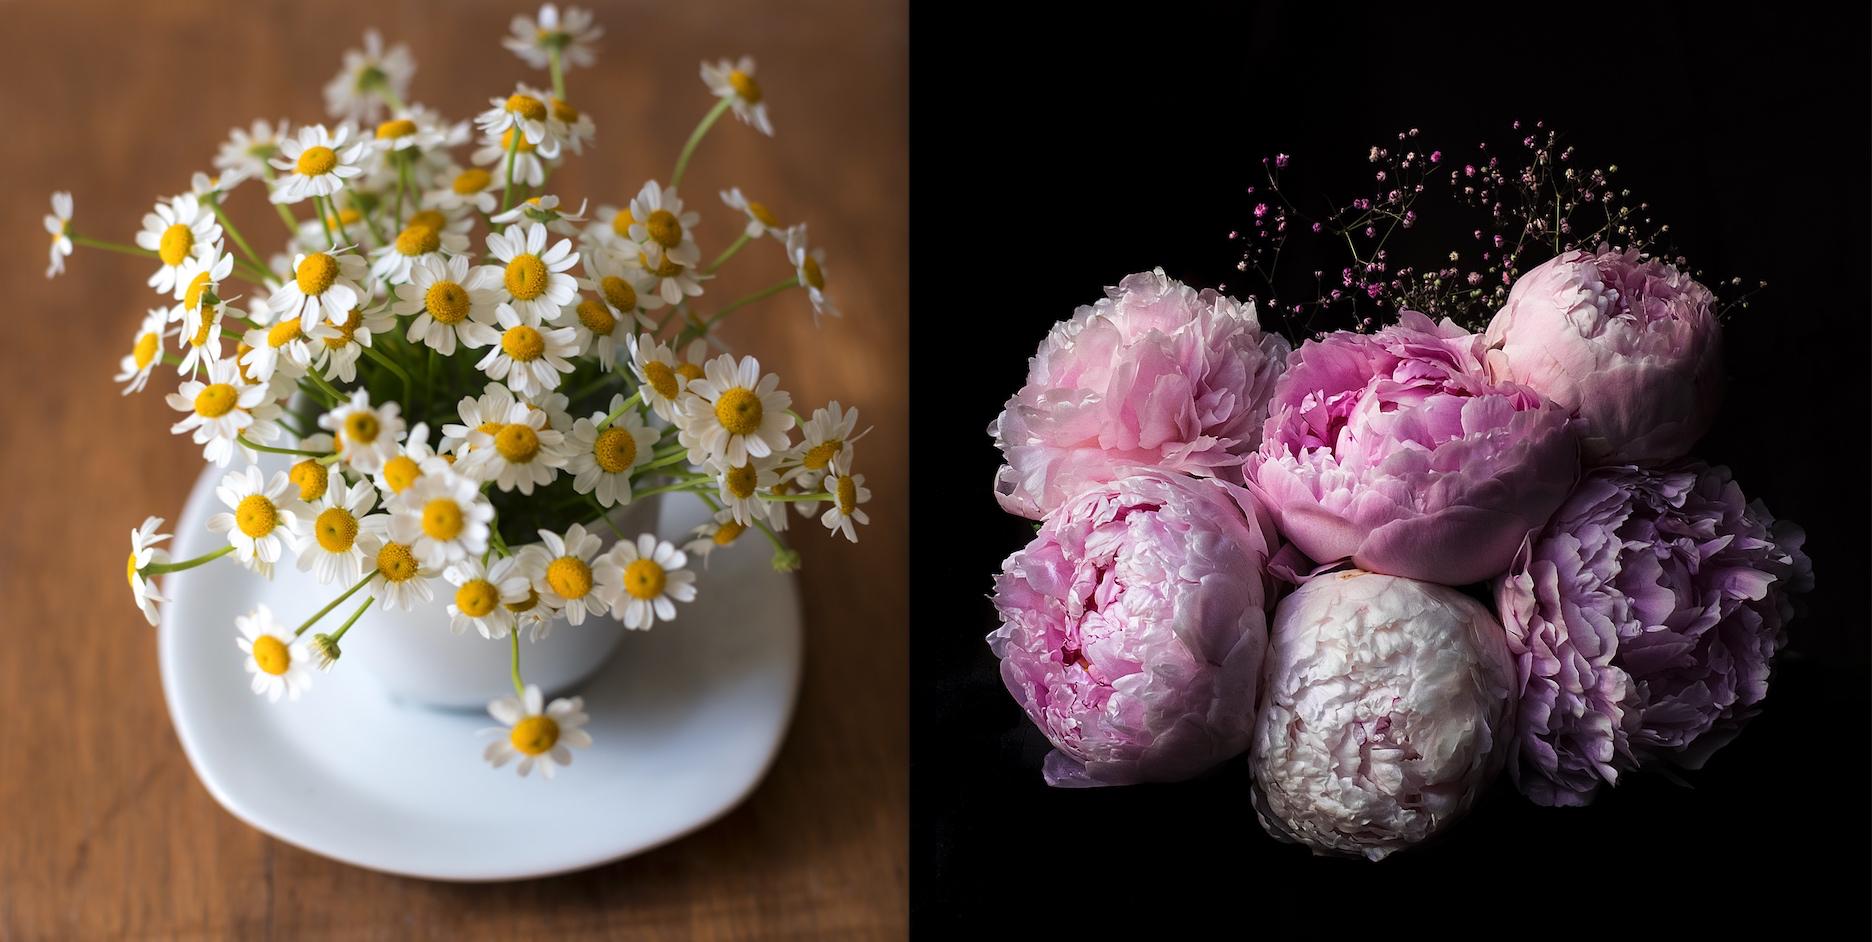 unsplash_flowers_spiritedtable_photo1.jpg